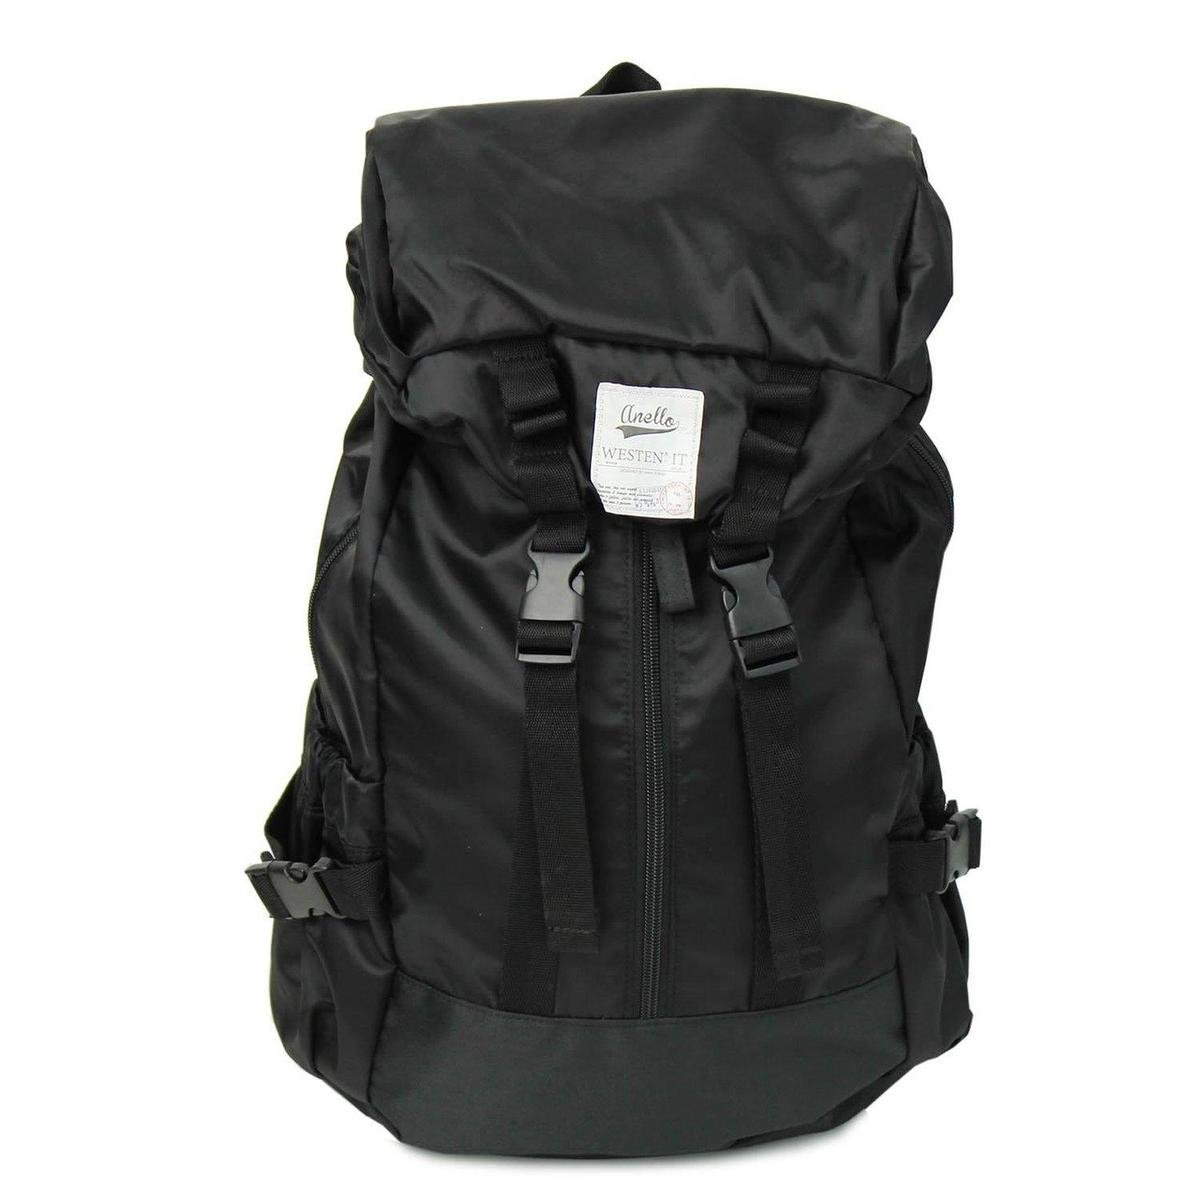 功能型大背包 AT28391-黑色